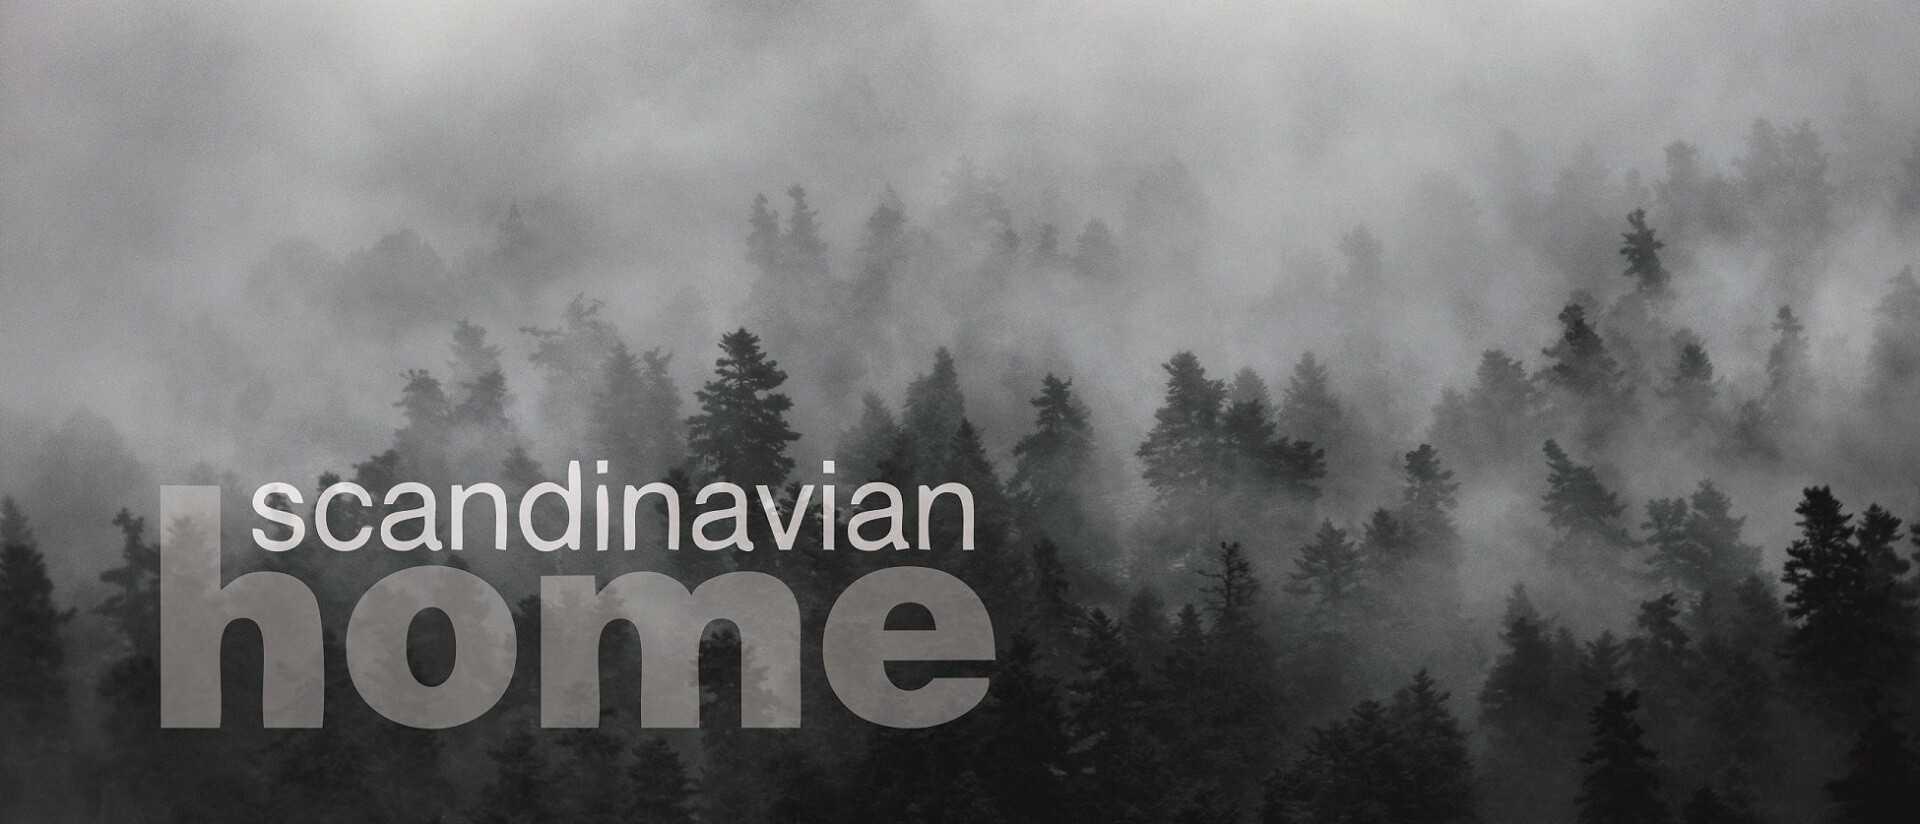 scandinavianhome